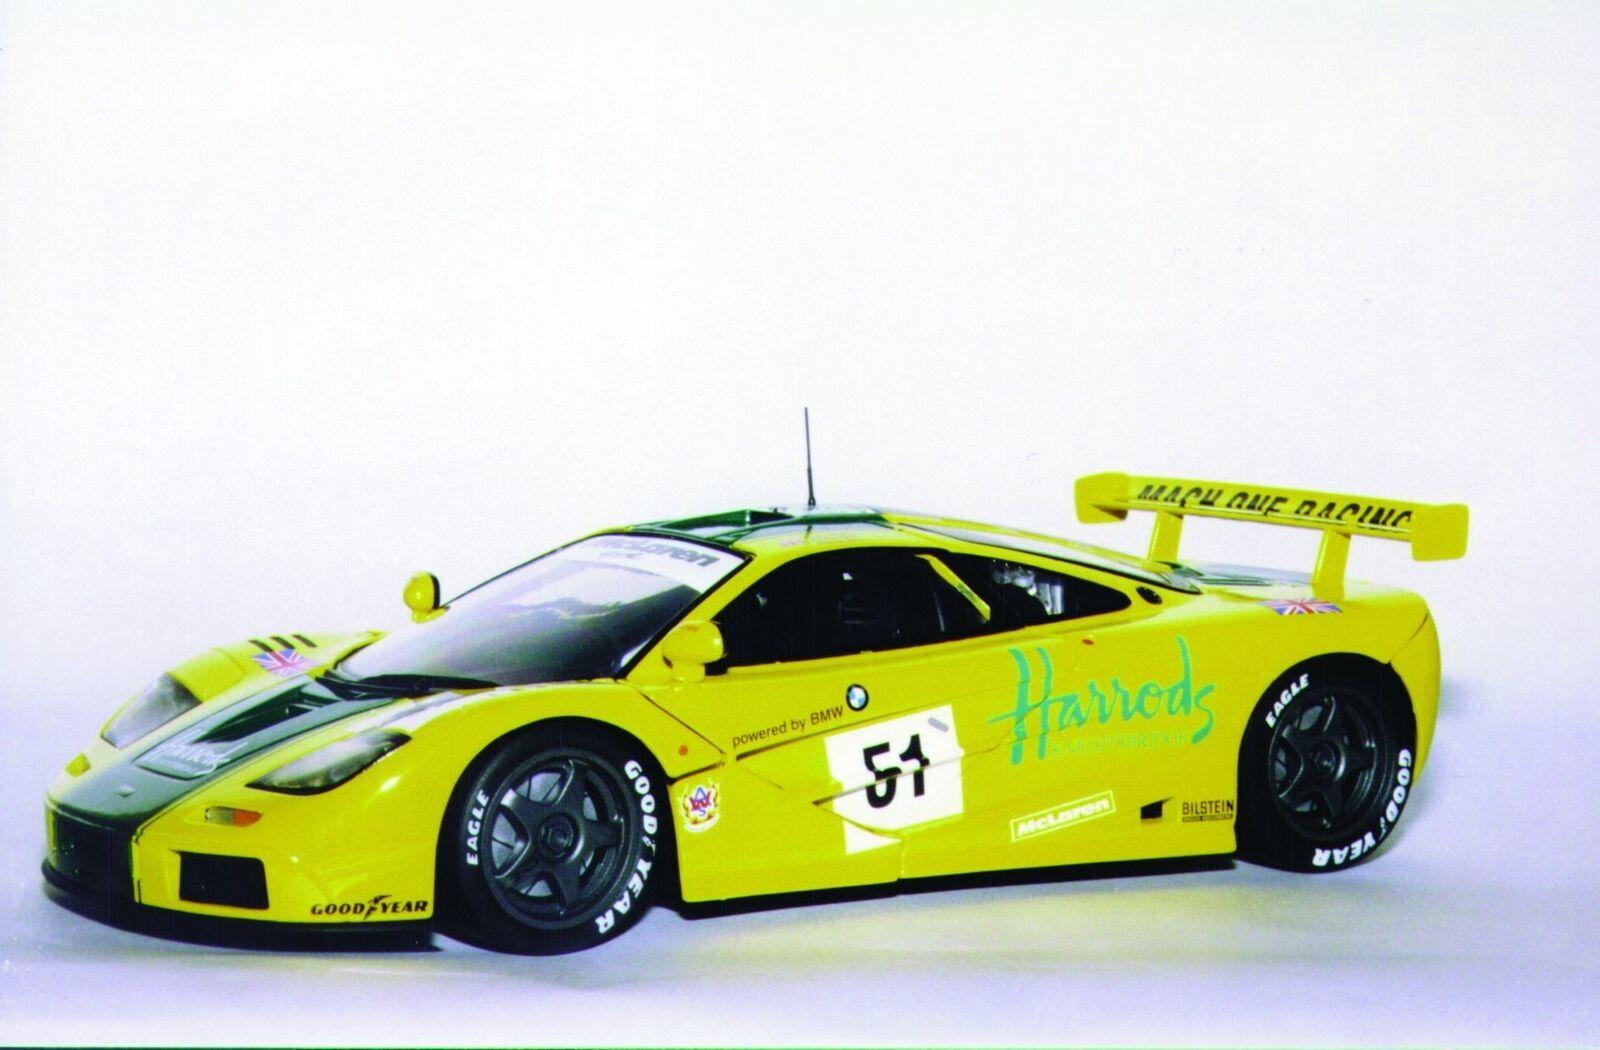 UT modelos McLaren F1 GTR'97 51 Harrod's'